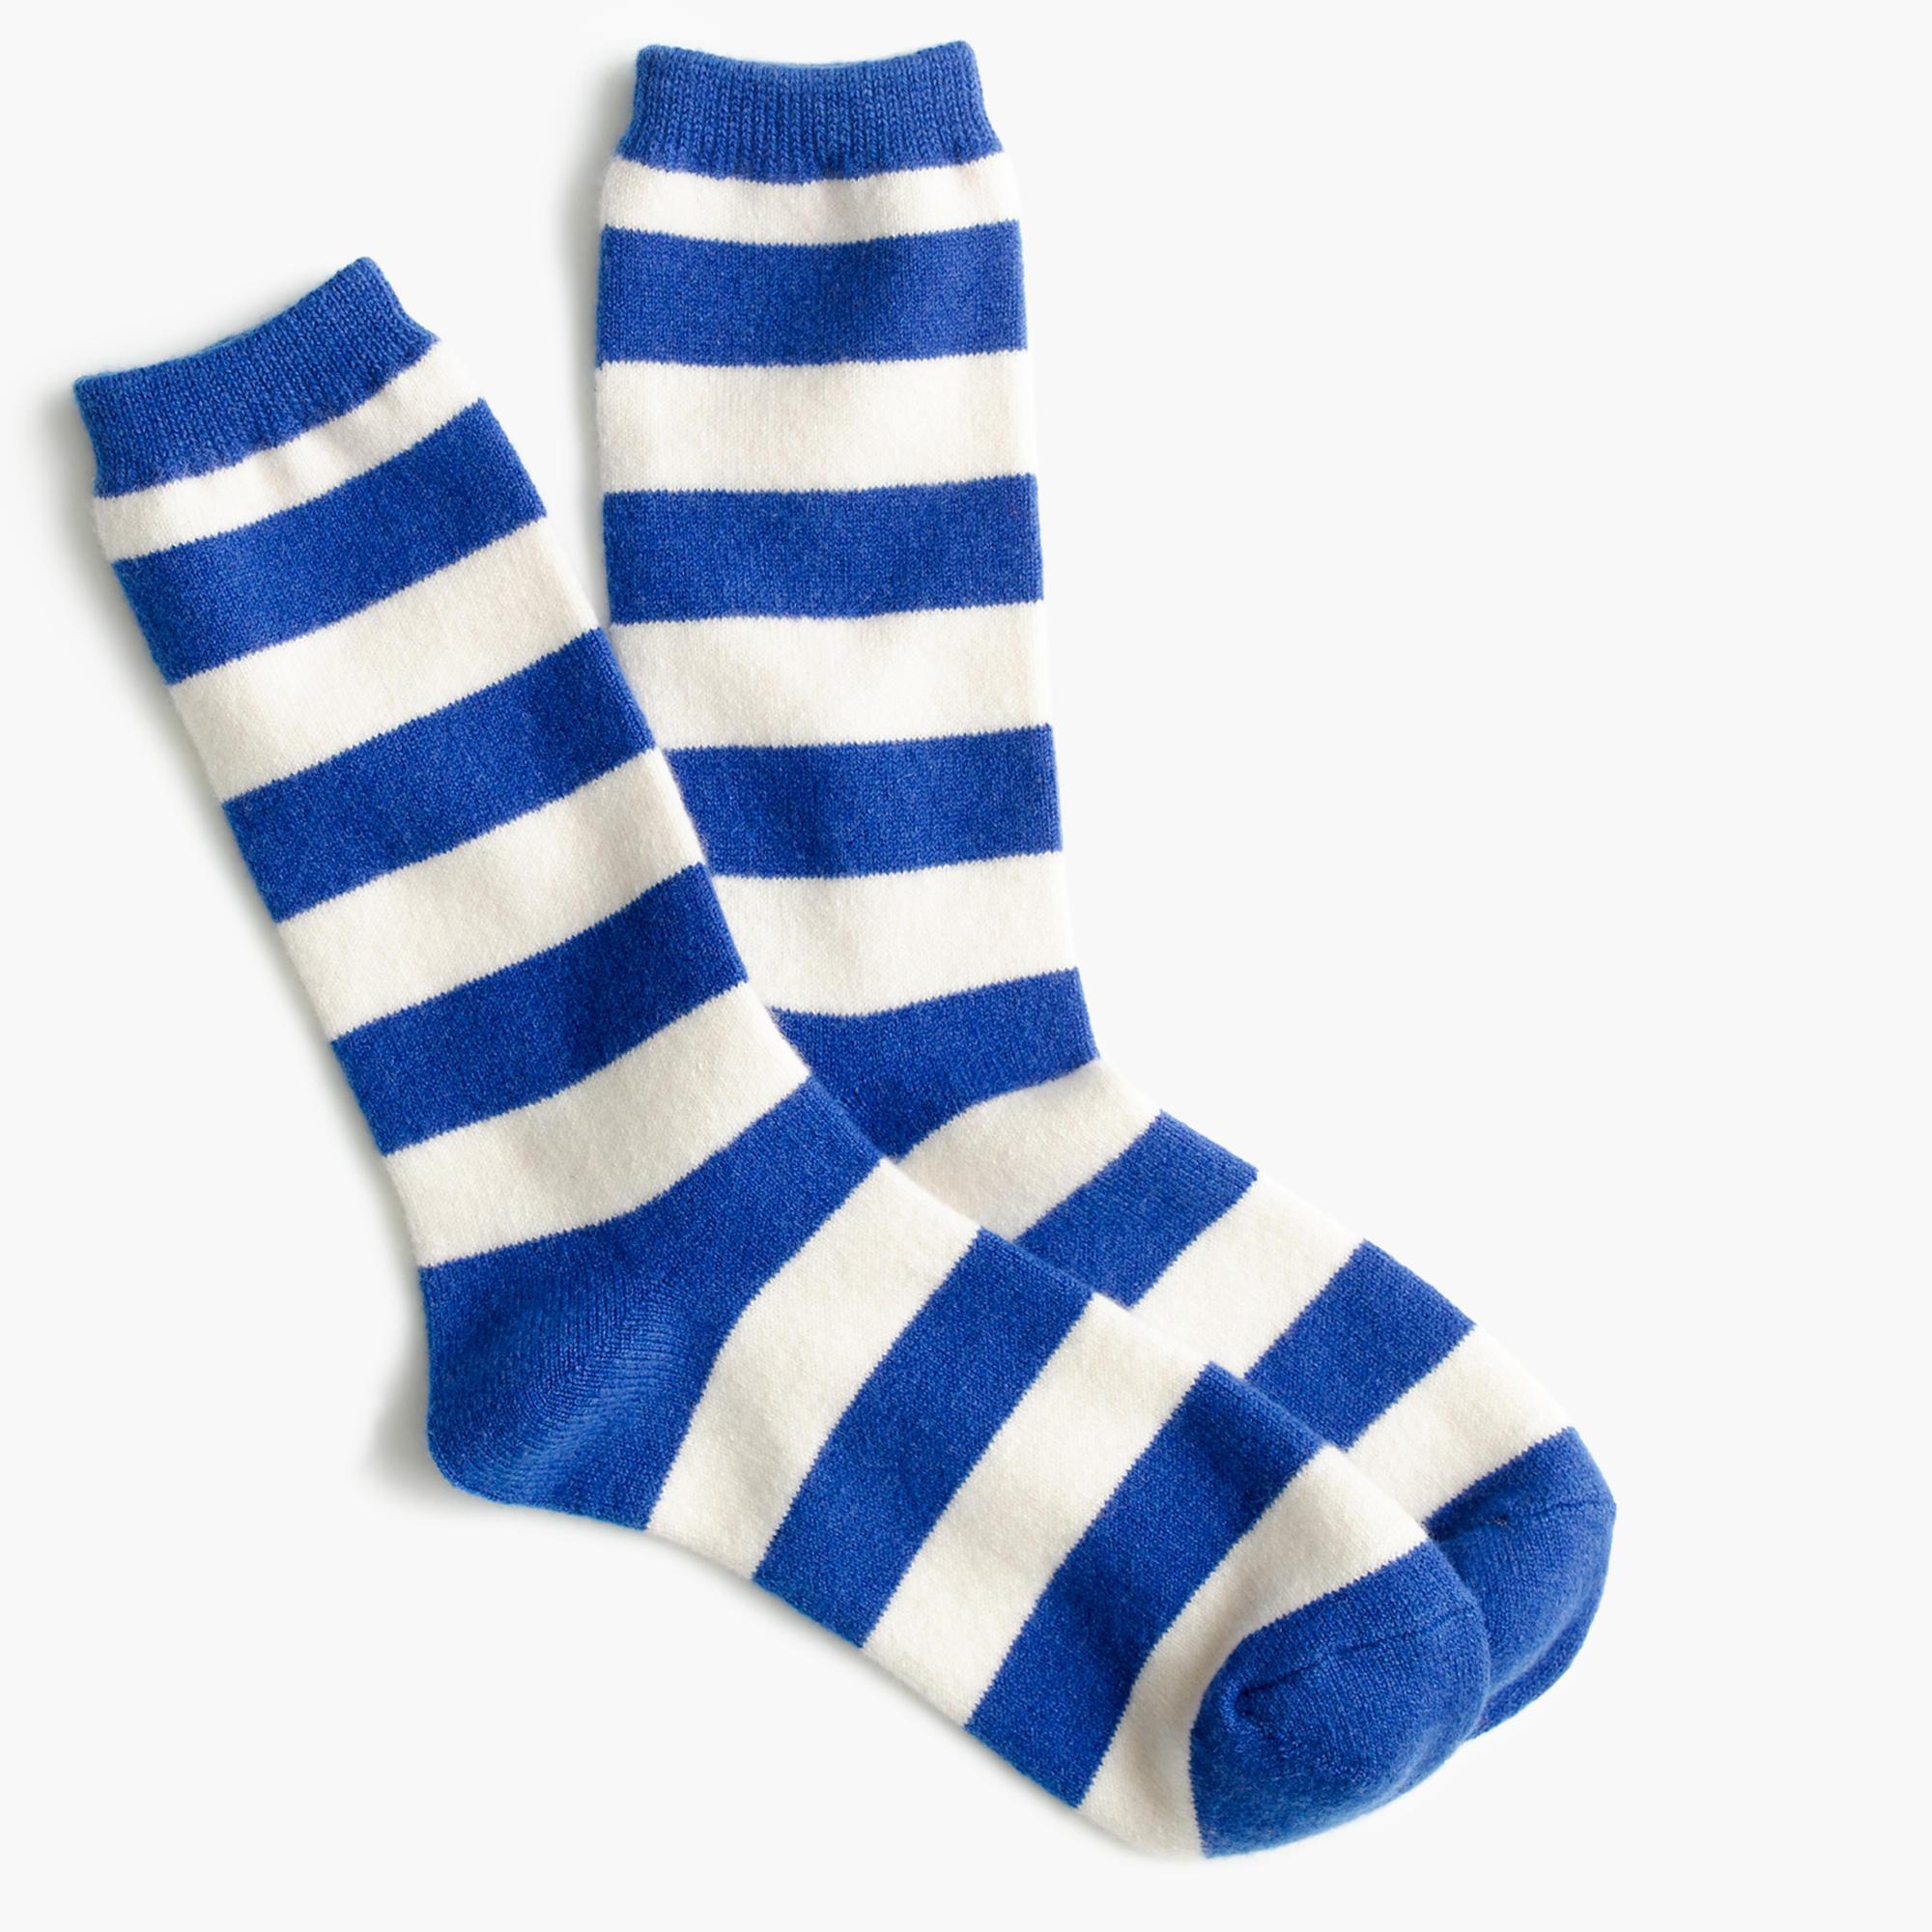 J.crew Striped Cashmere Trouser Sock in Blue for Men